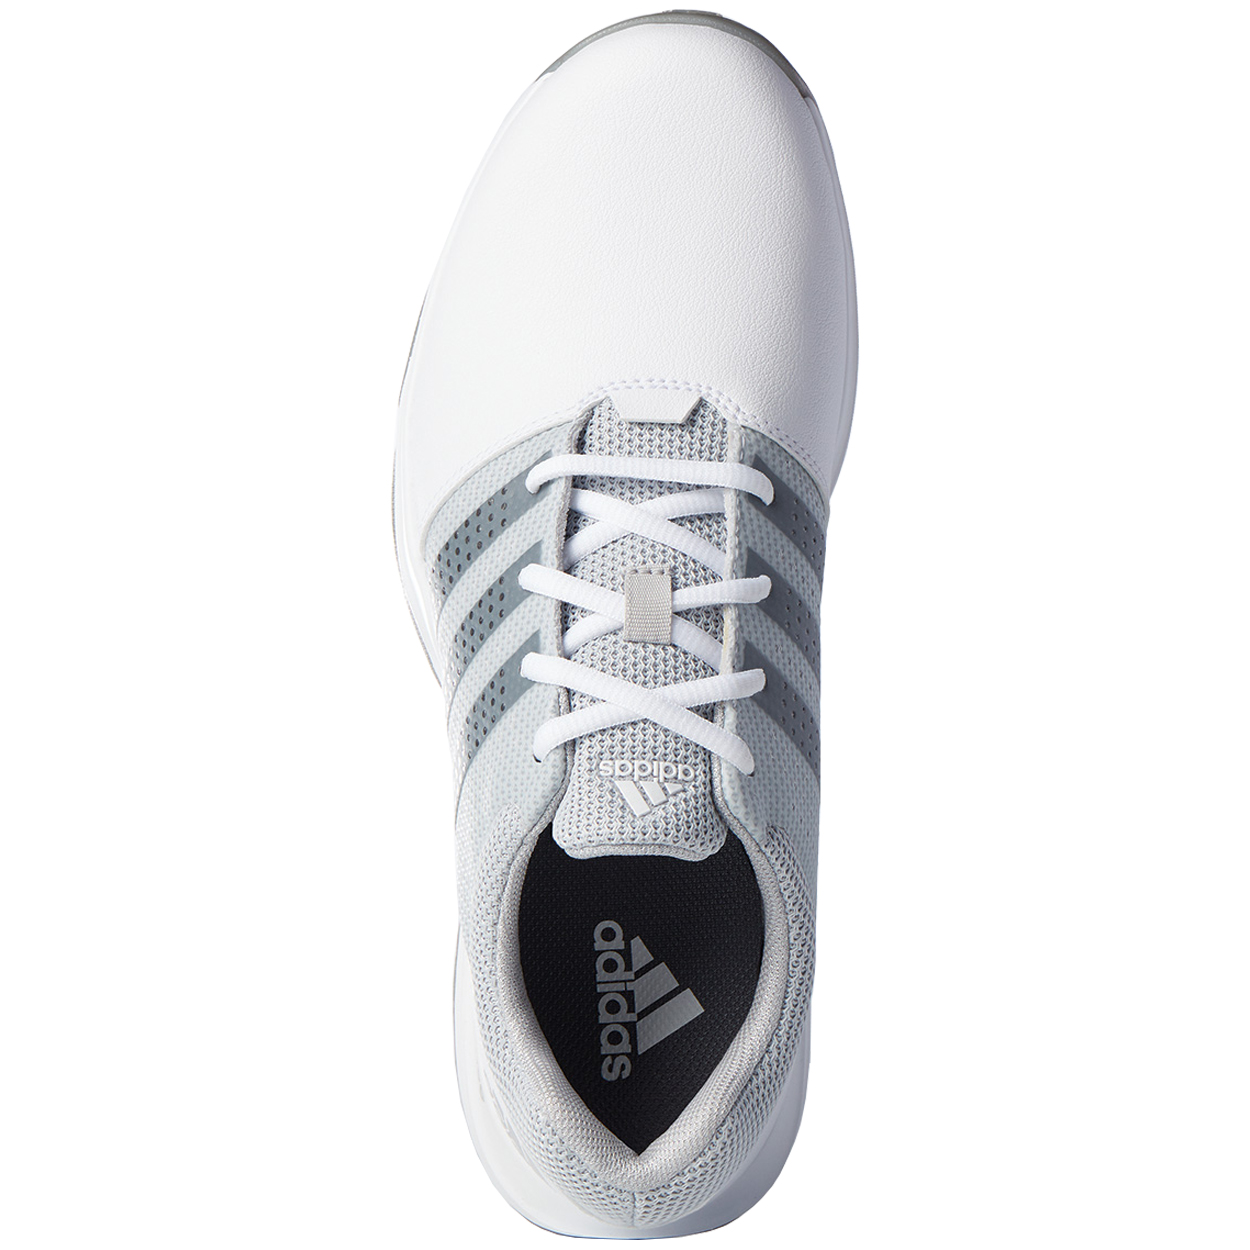 Adidas-Men-039-s-360-Traxion-Golf-Shoes thumbnail 17